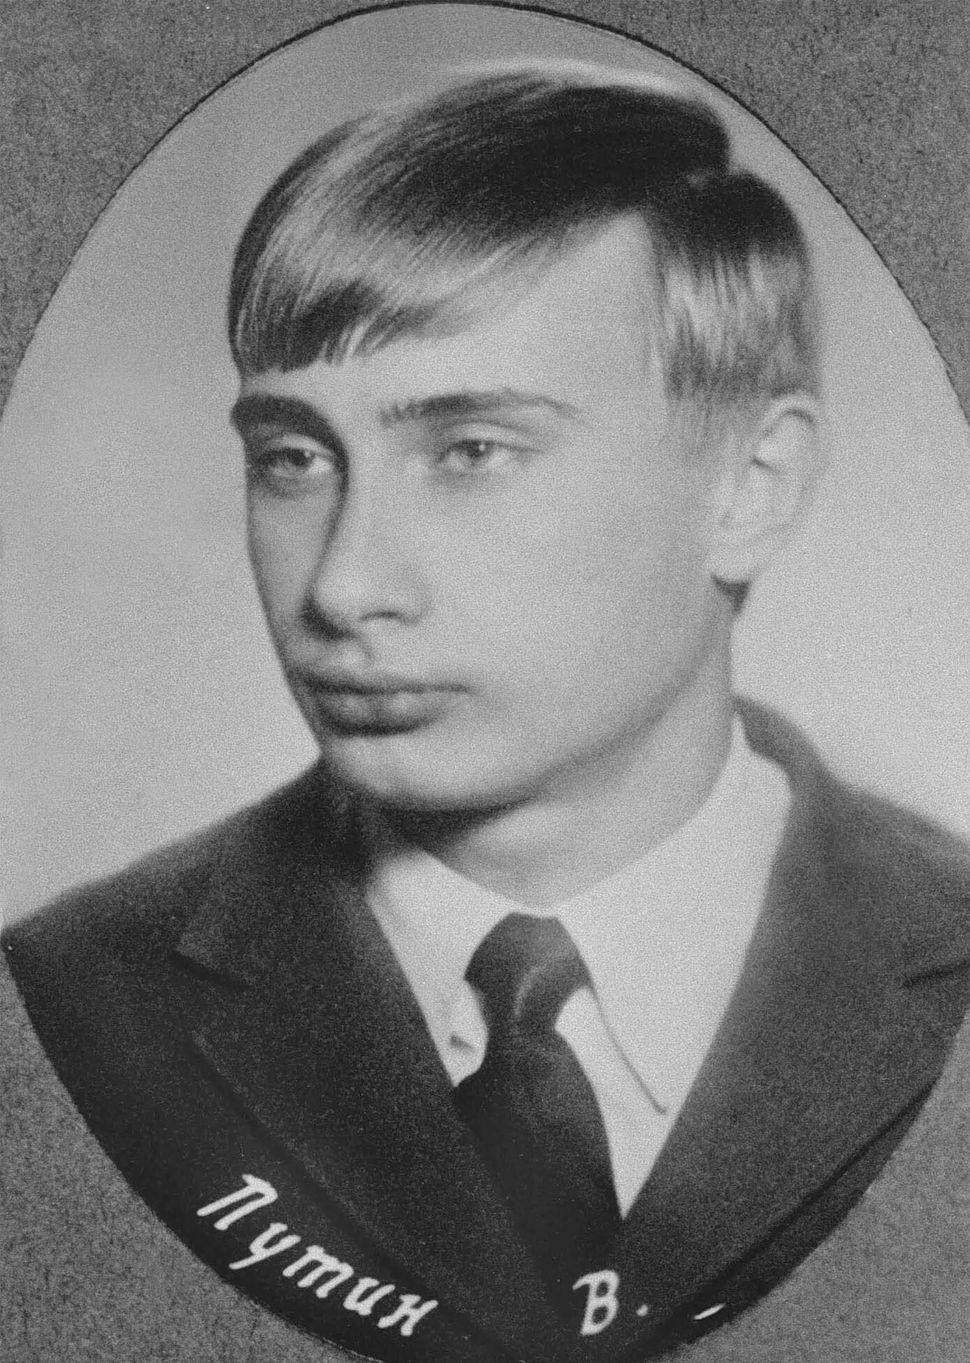 Vladimir Putin in Saint Petersburg, Russia, 1970.